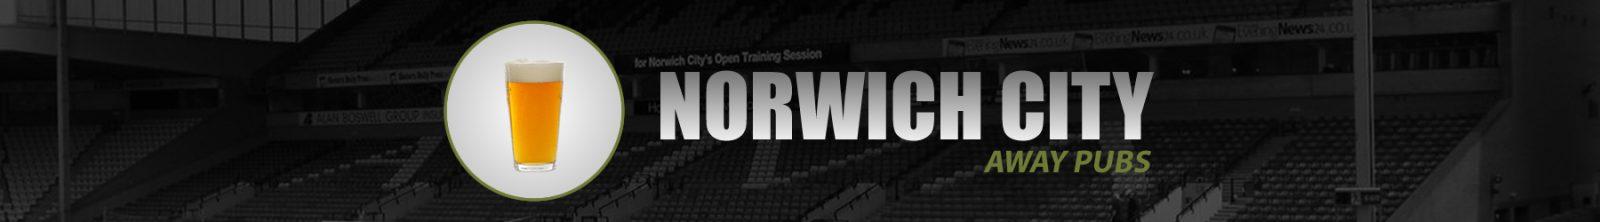 Norwich City Away Pubs